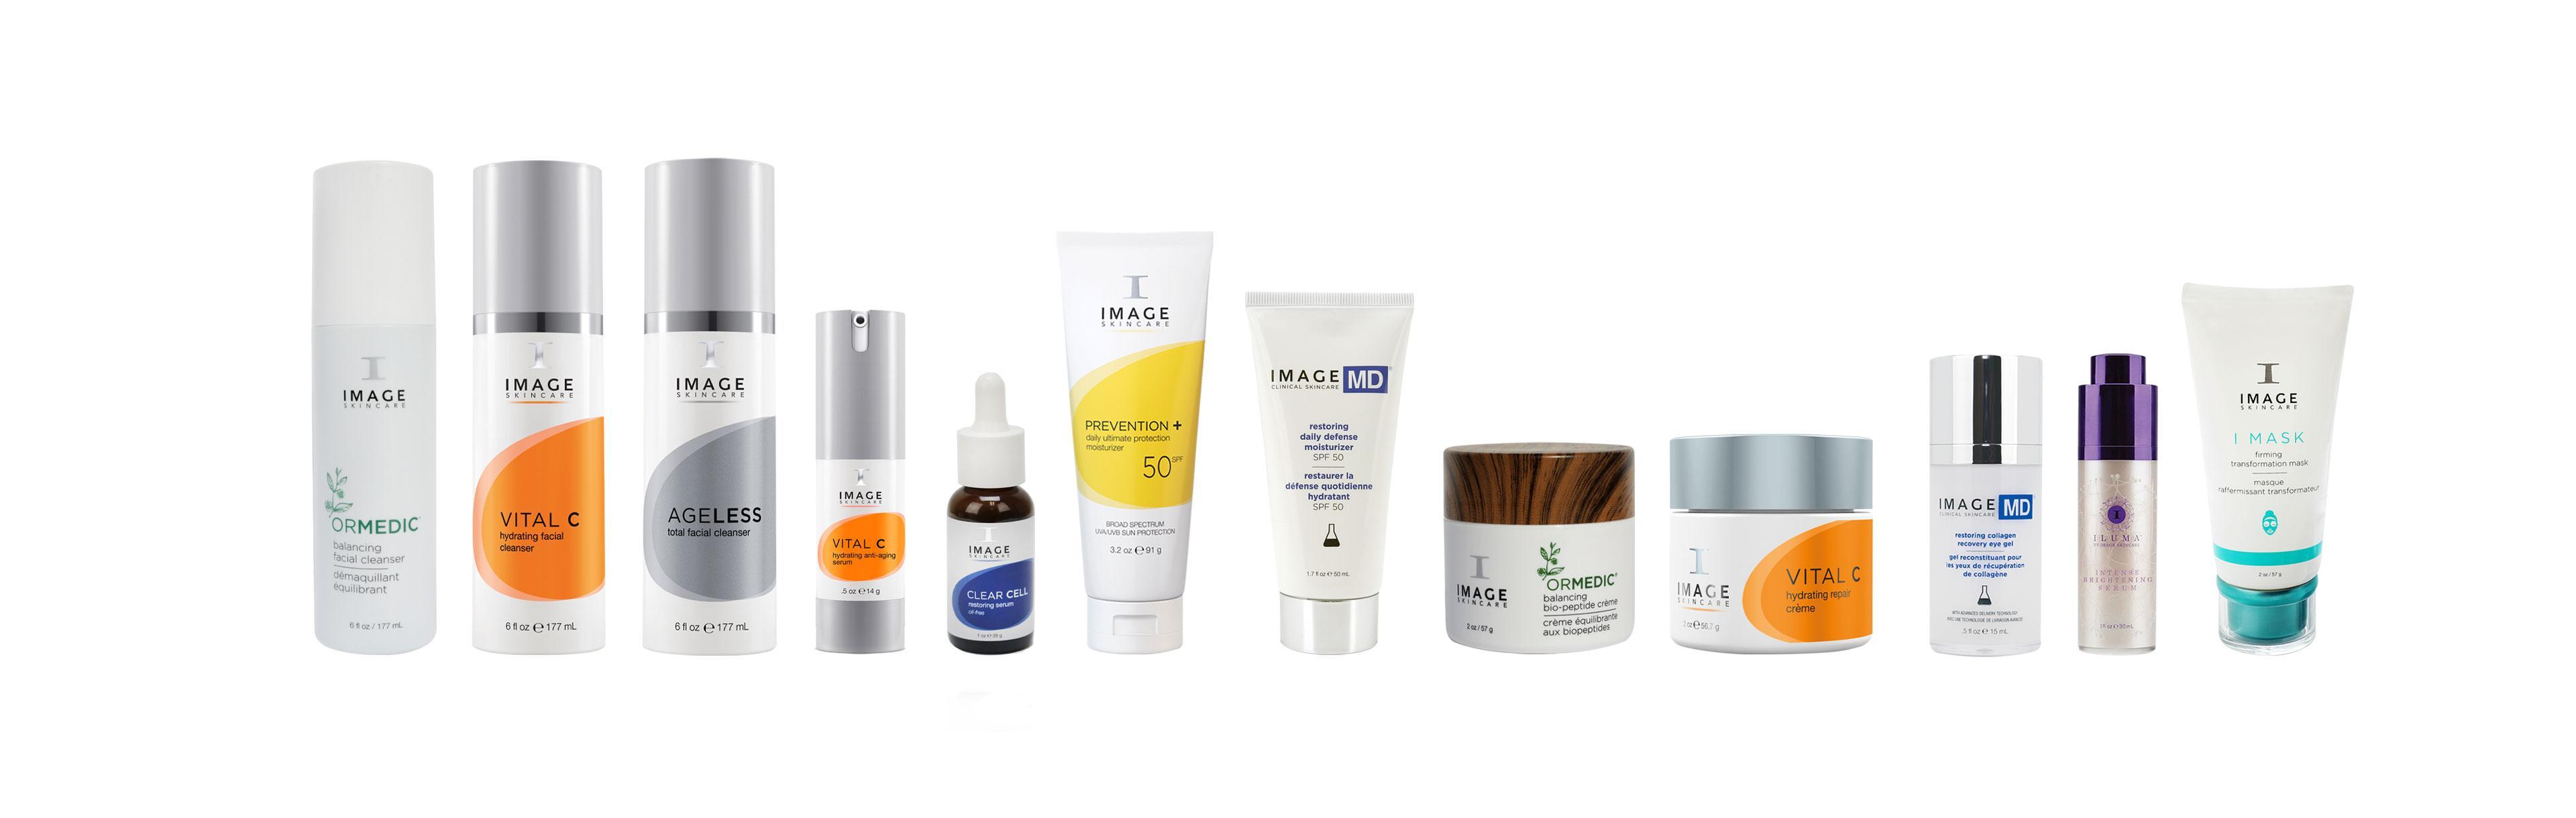 De top 10 IMAGE Skincare producten